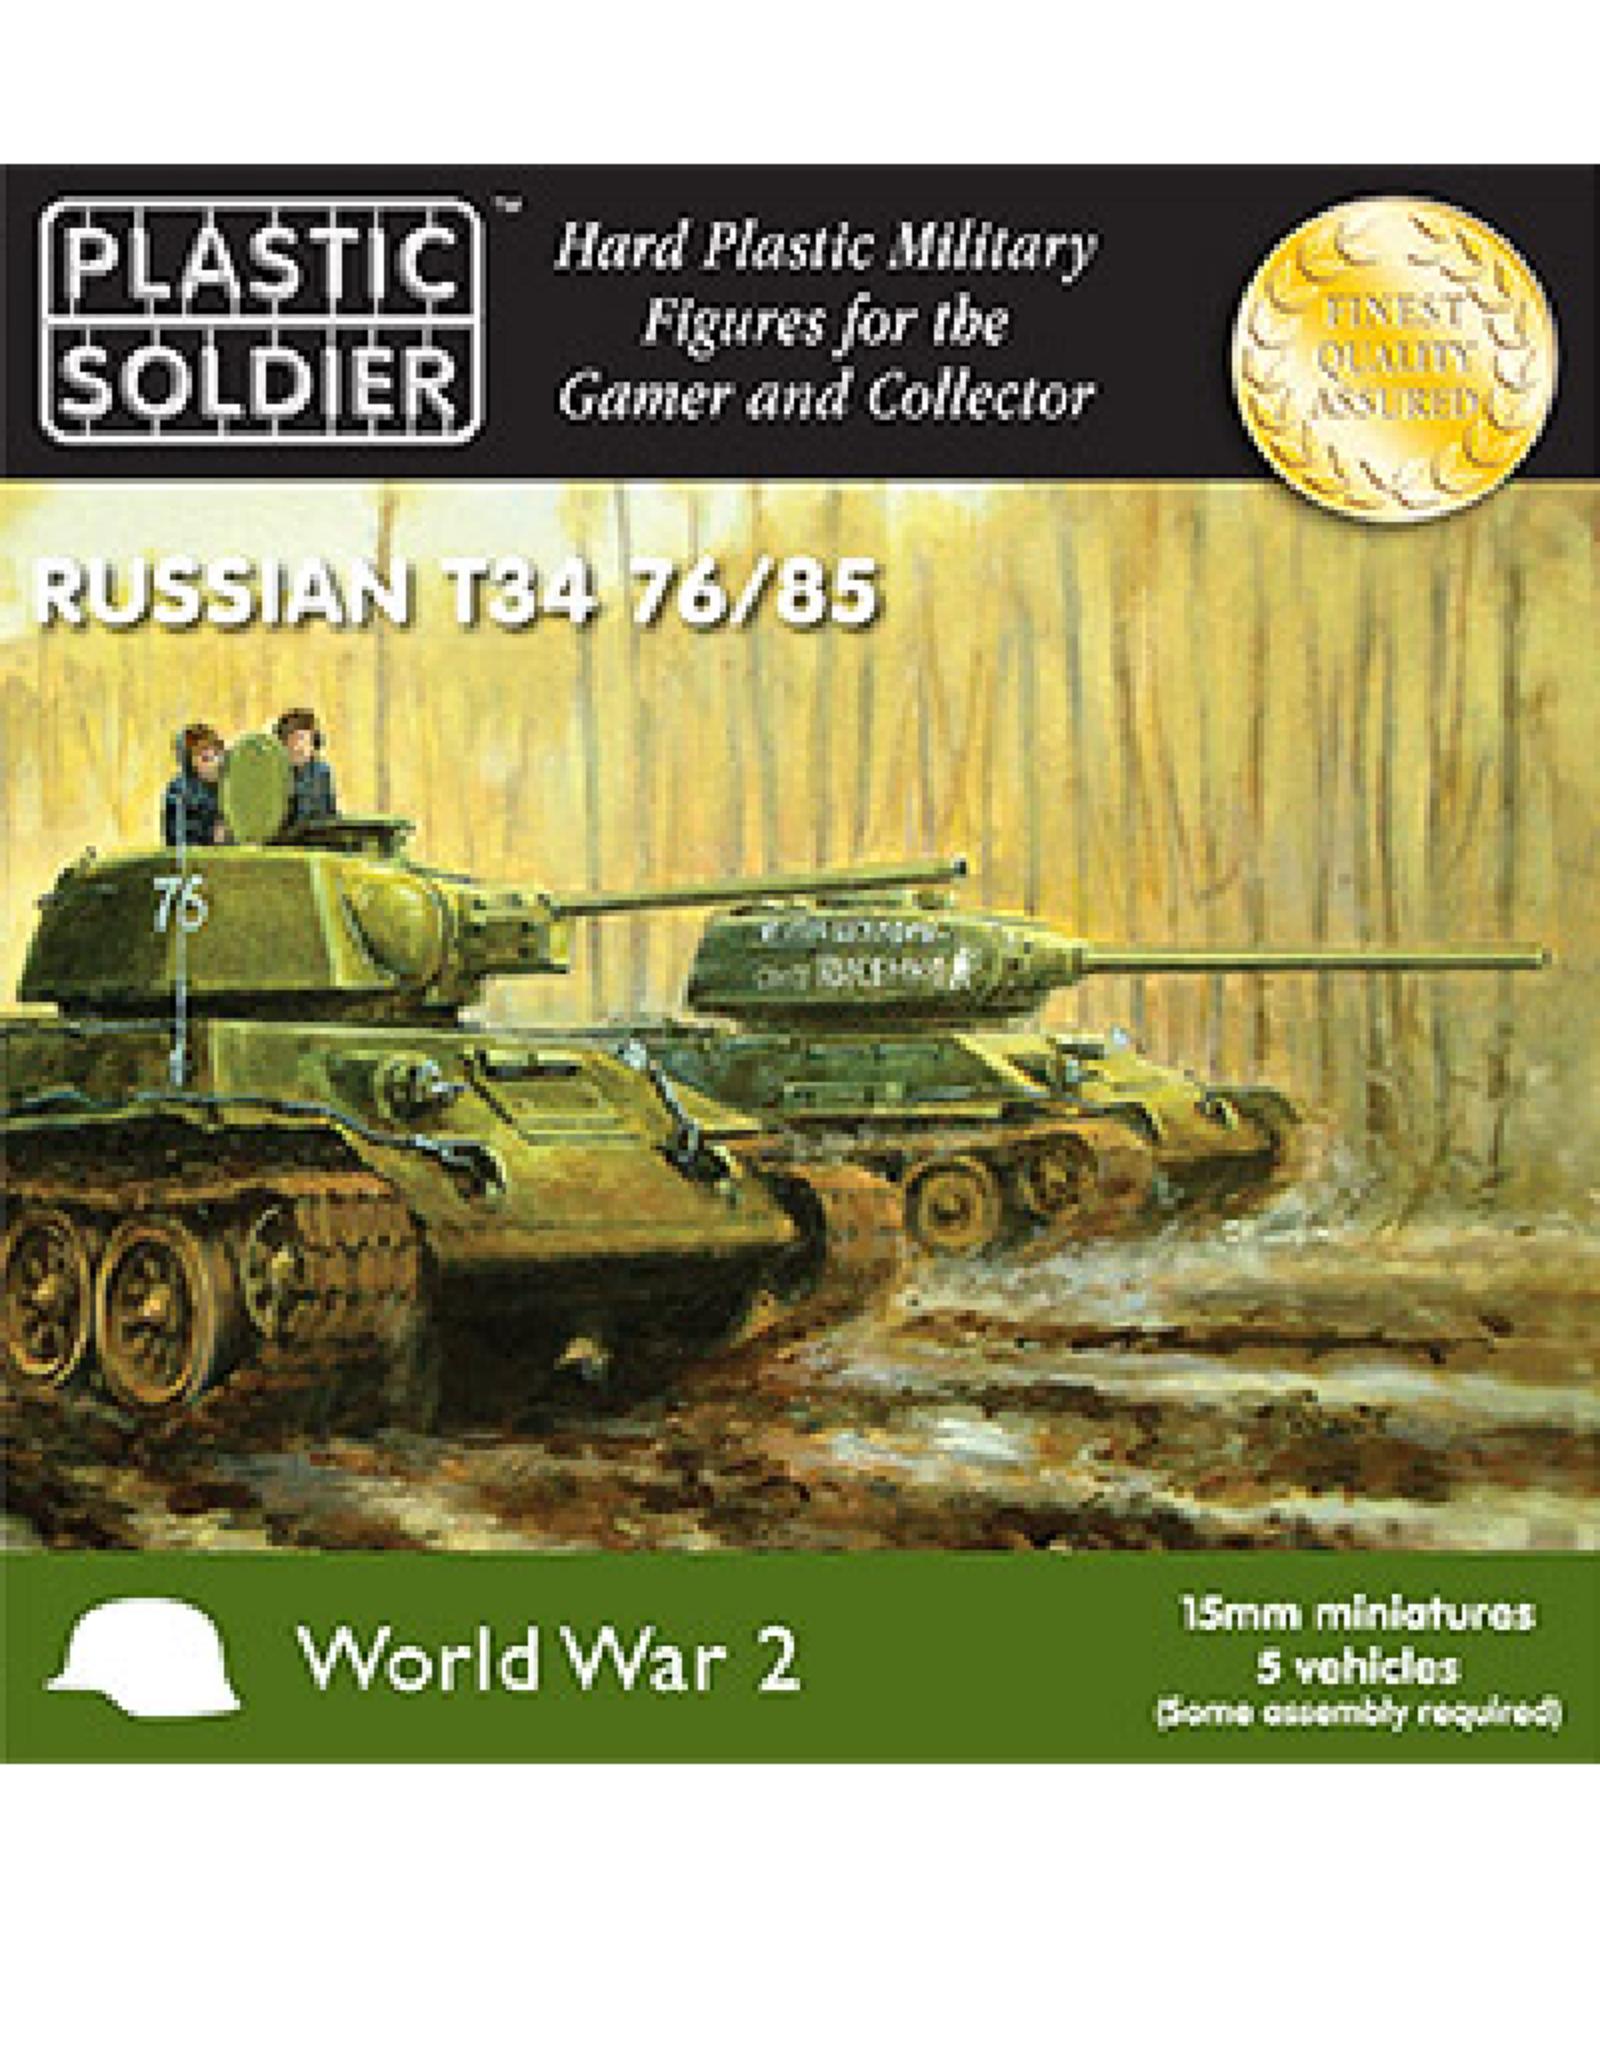 Plastic Soldier Company T-34 76/85